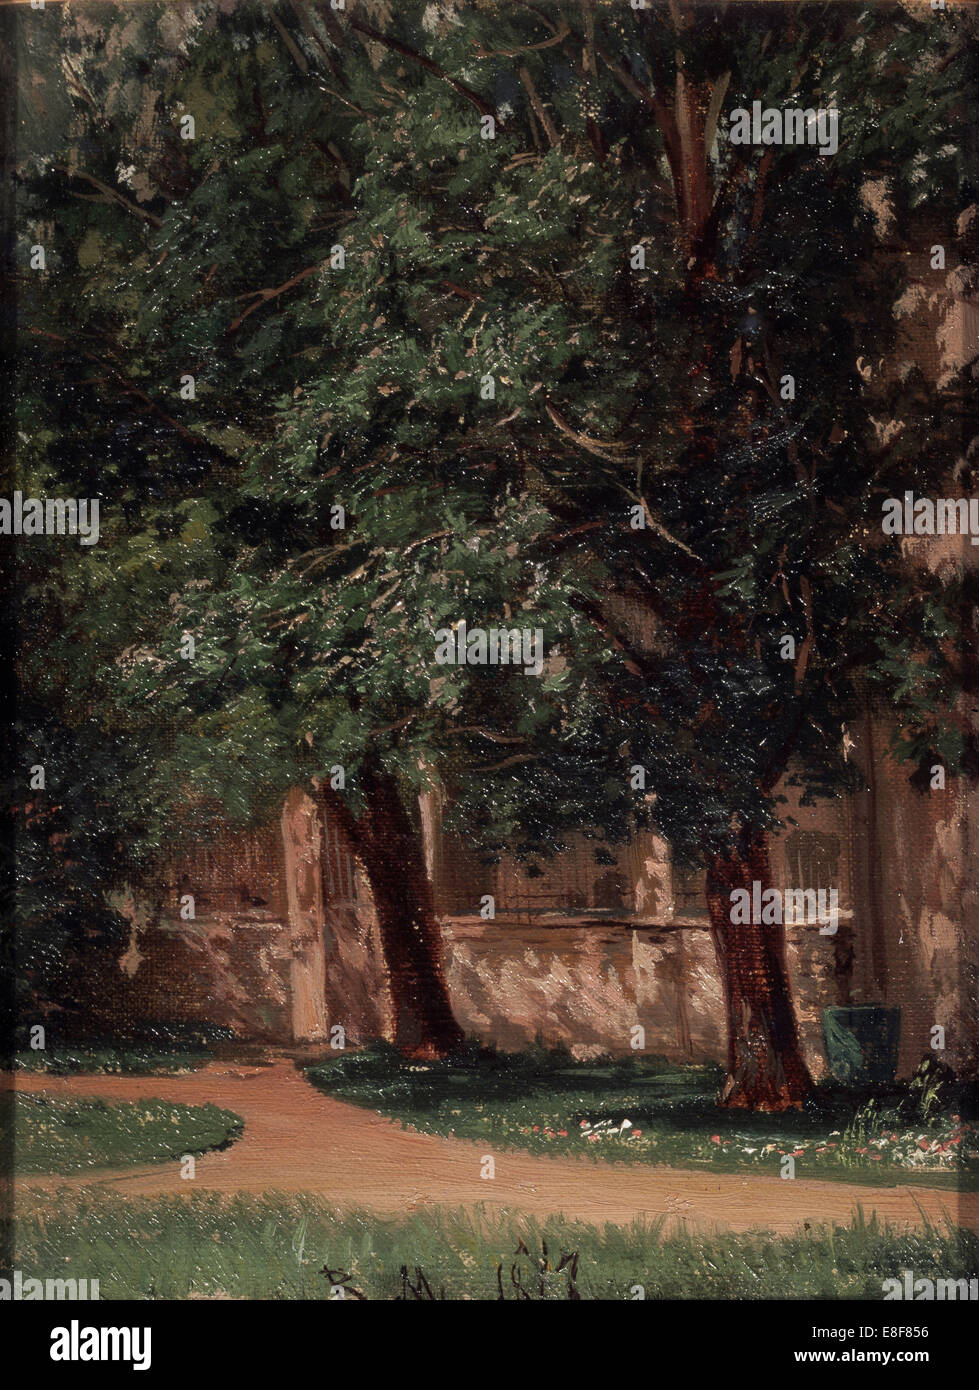 Near the Tretiakov's House. Artist: Maximov, Vasili Maximovich (1844-1911) - Stock Image